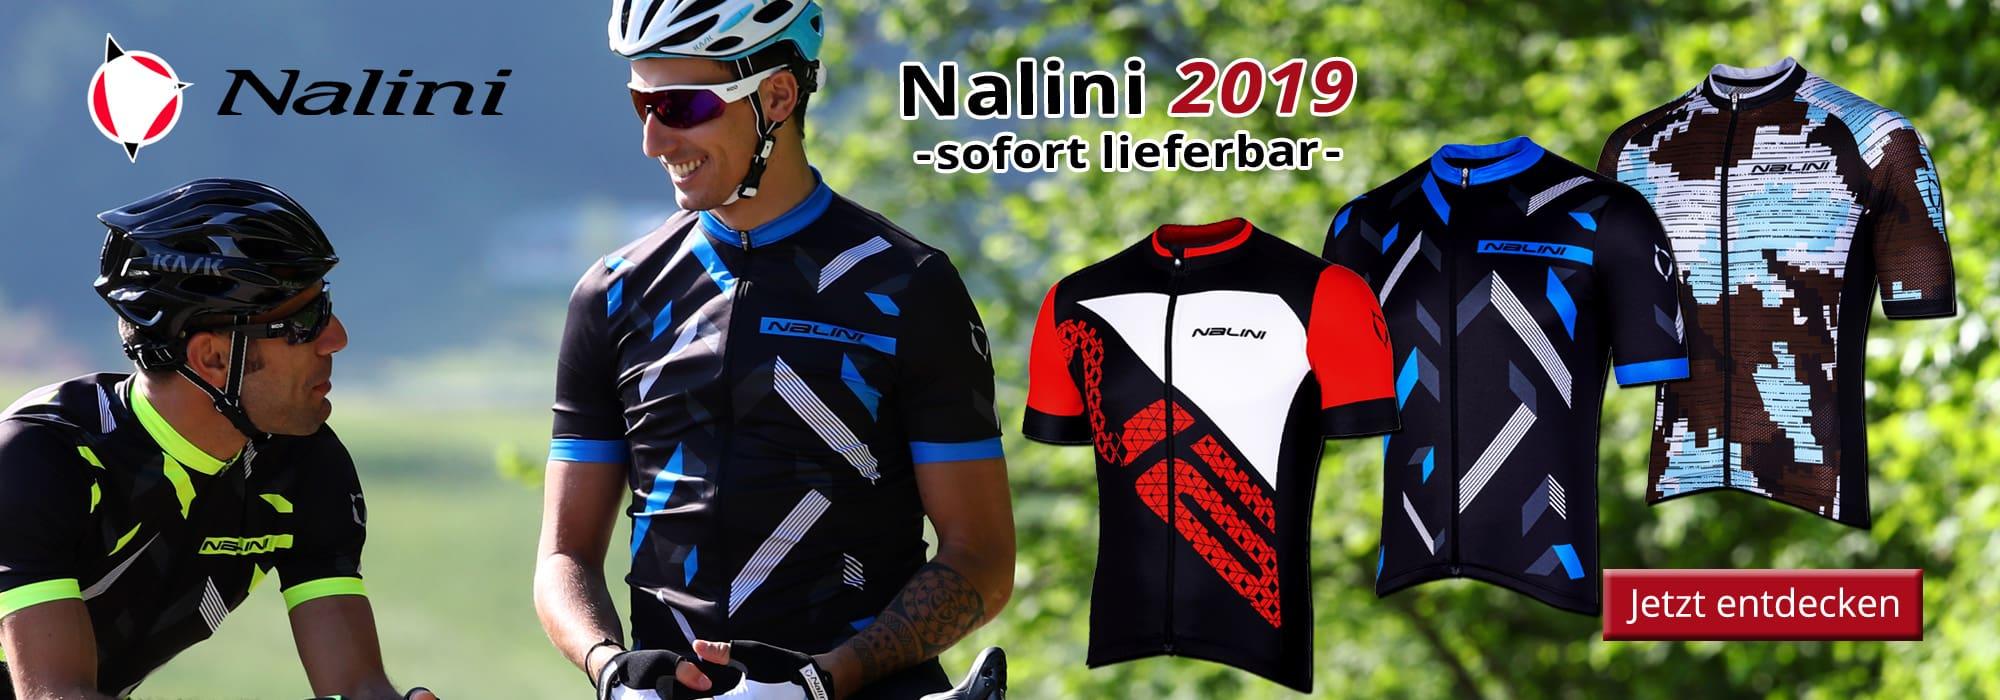 Nalini Frühling/Sommer 2019 ab sofort lieferbar